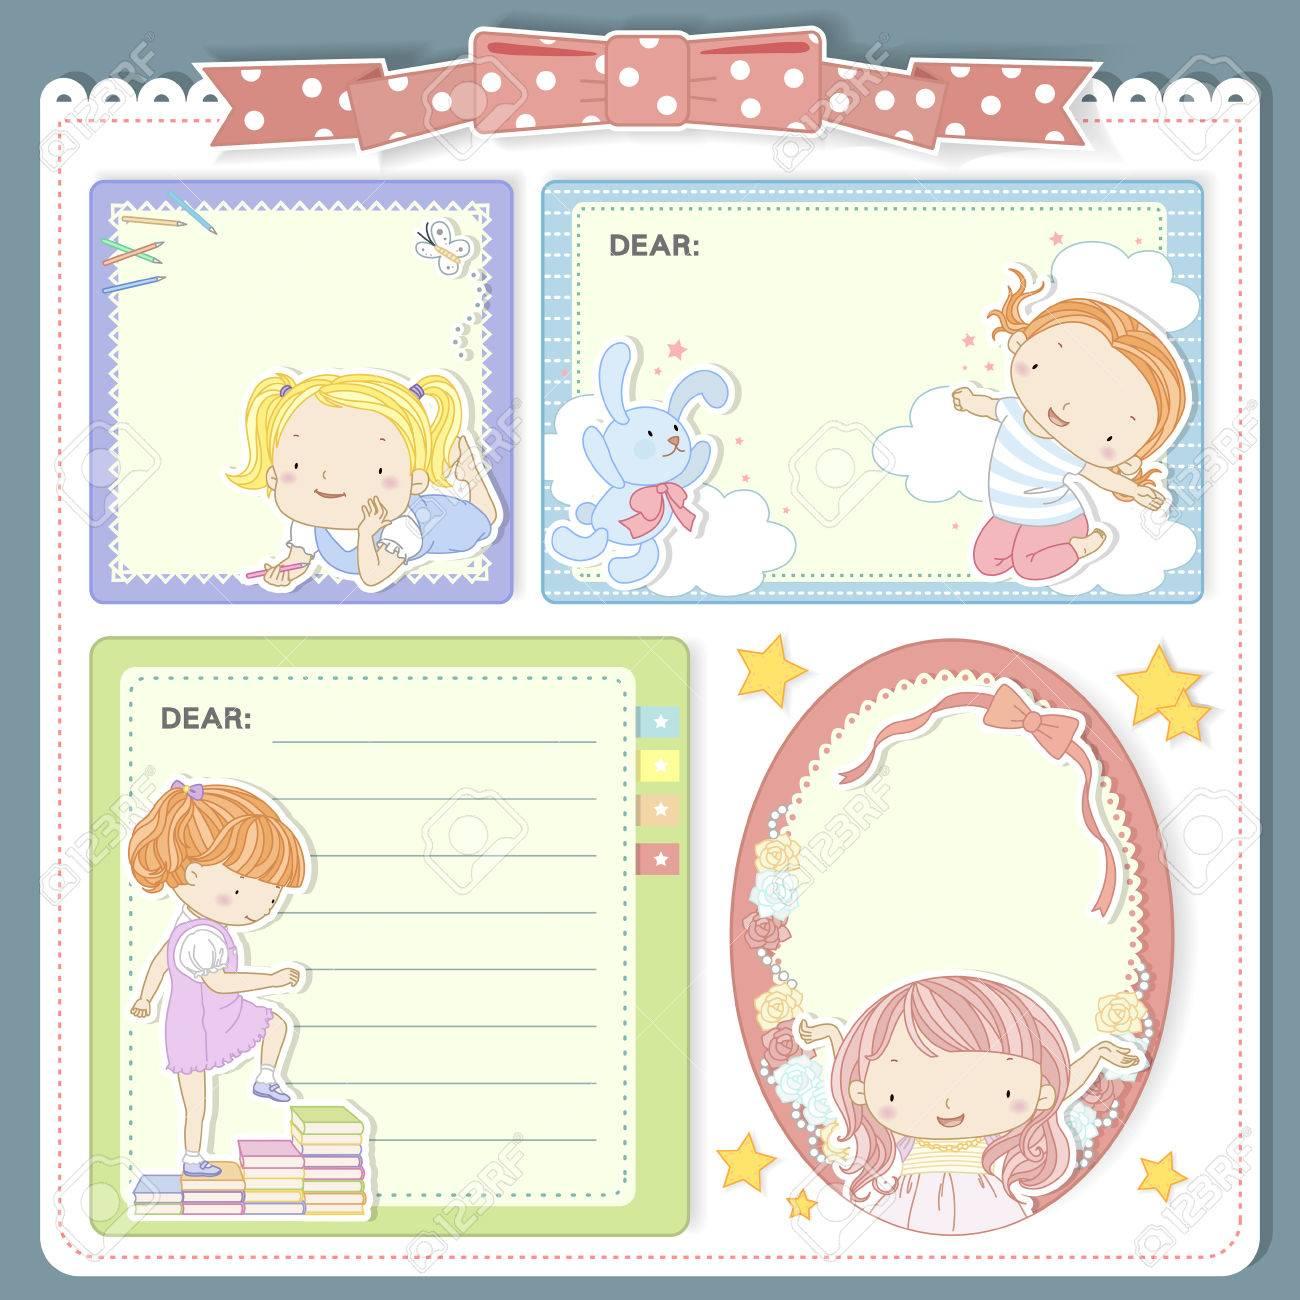 adorable cartoon style memo pad template design set stock vector 44559990